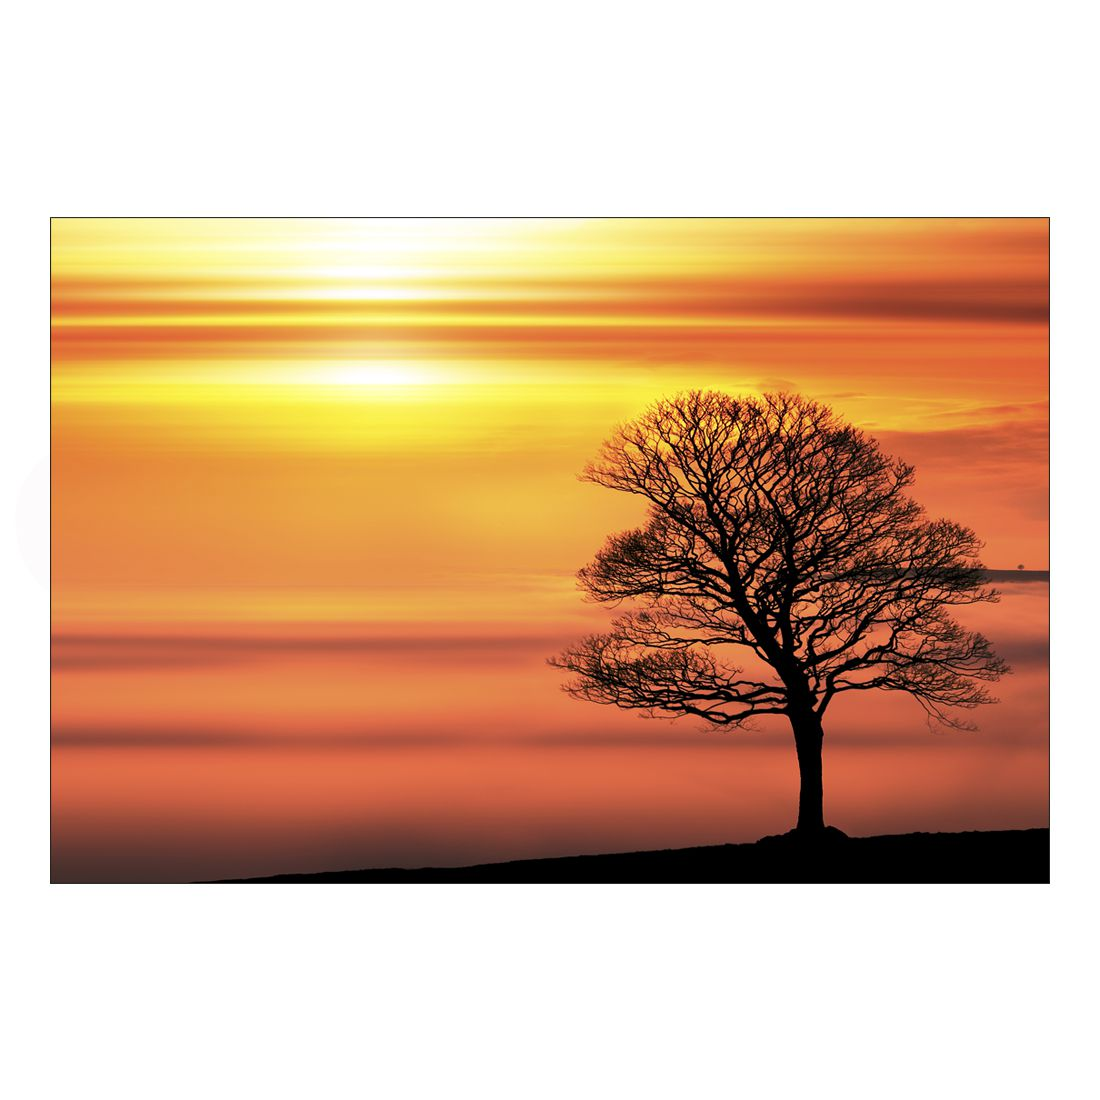 Acrylglasbild Lone Tree – Abmessung 30×20 cm, Gallery of Innovative Art günstig kaufen